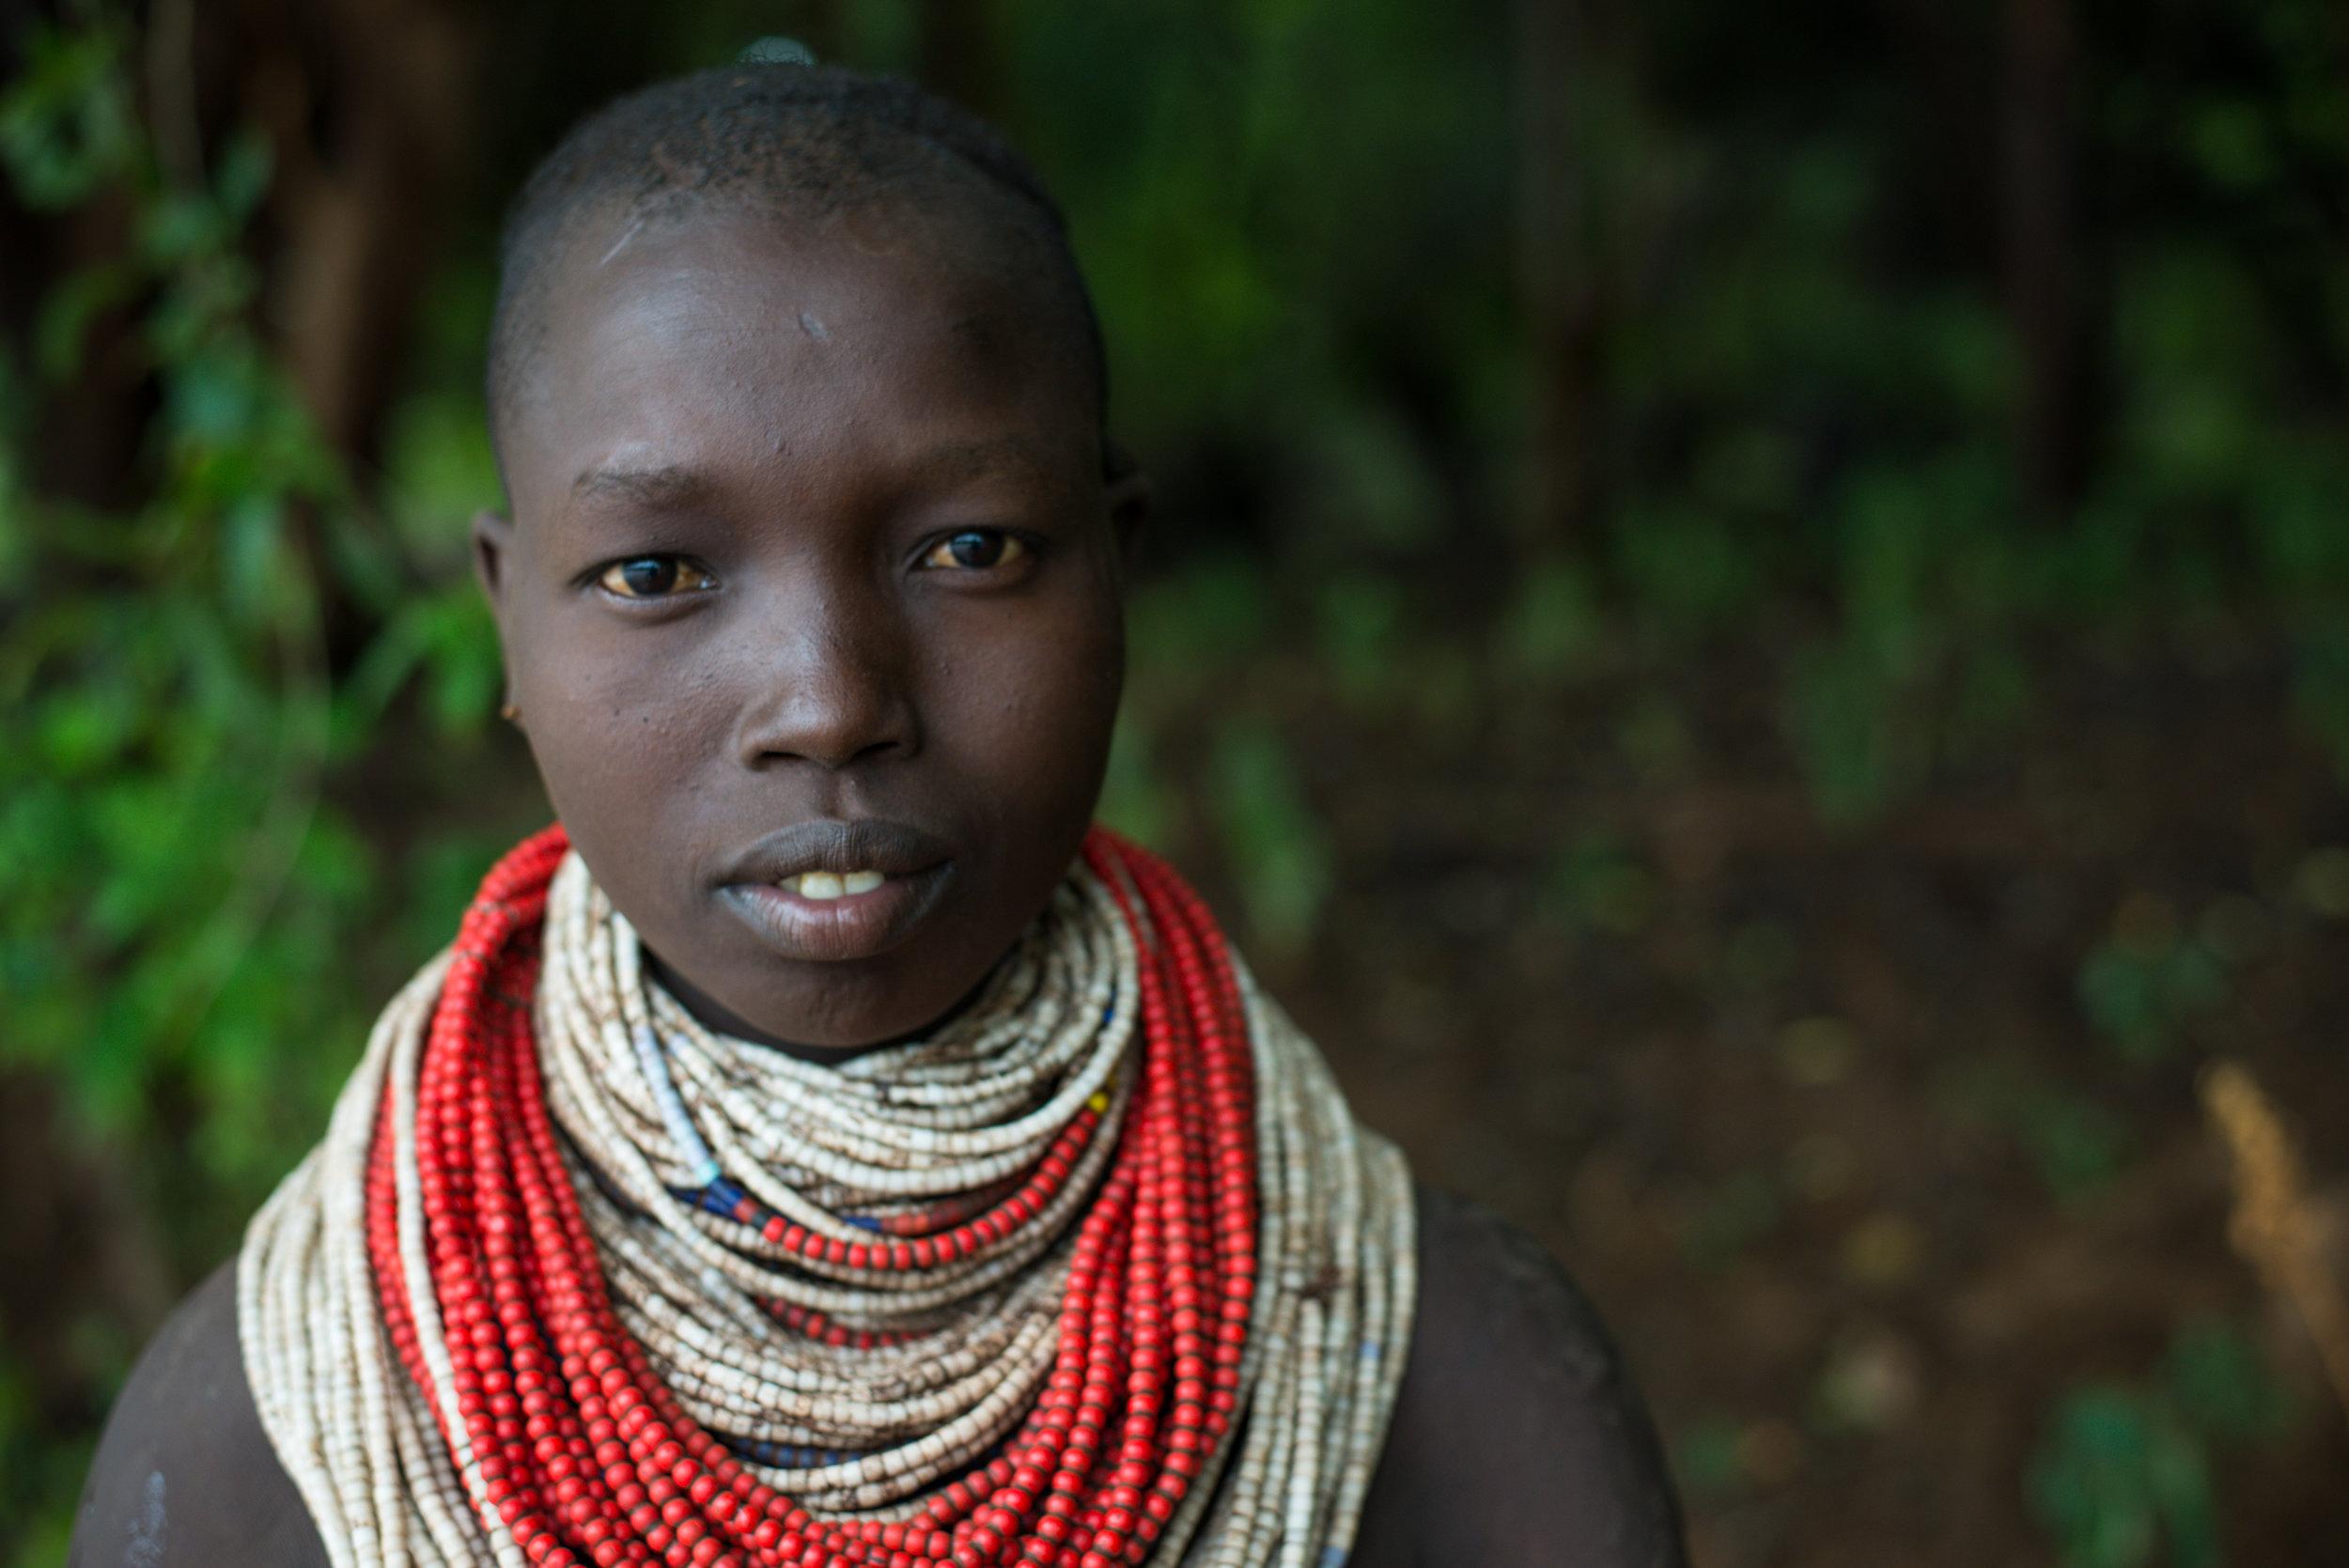 OMO RIVER VALLEY - ETHIOPIA, KENYA